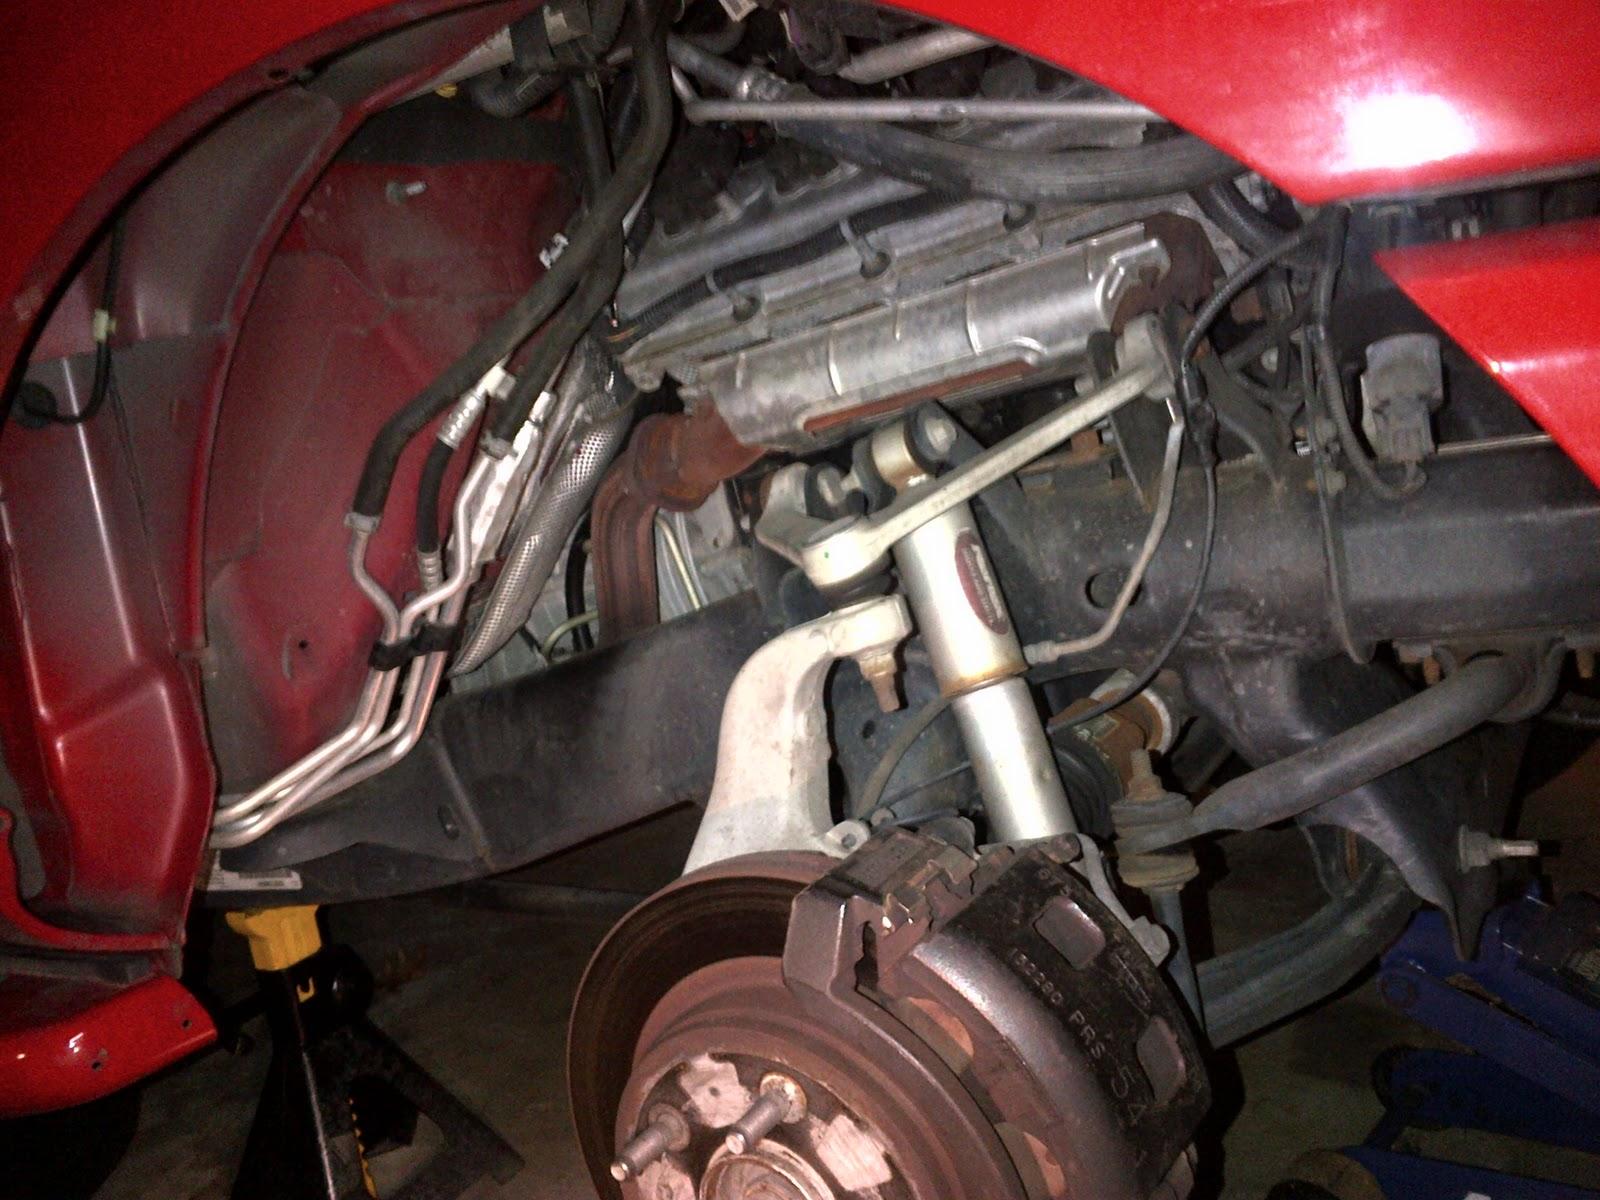 2005 Dodge Stratus >> Changing A/C Evaporatore and Heater Core - 2004 Dodge Durango | Mike's Adventures